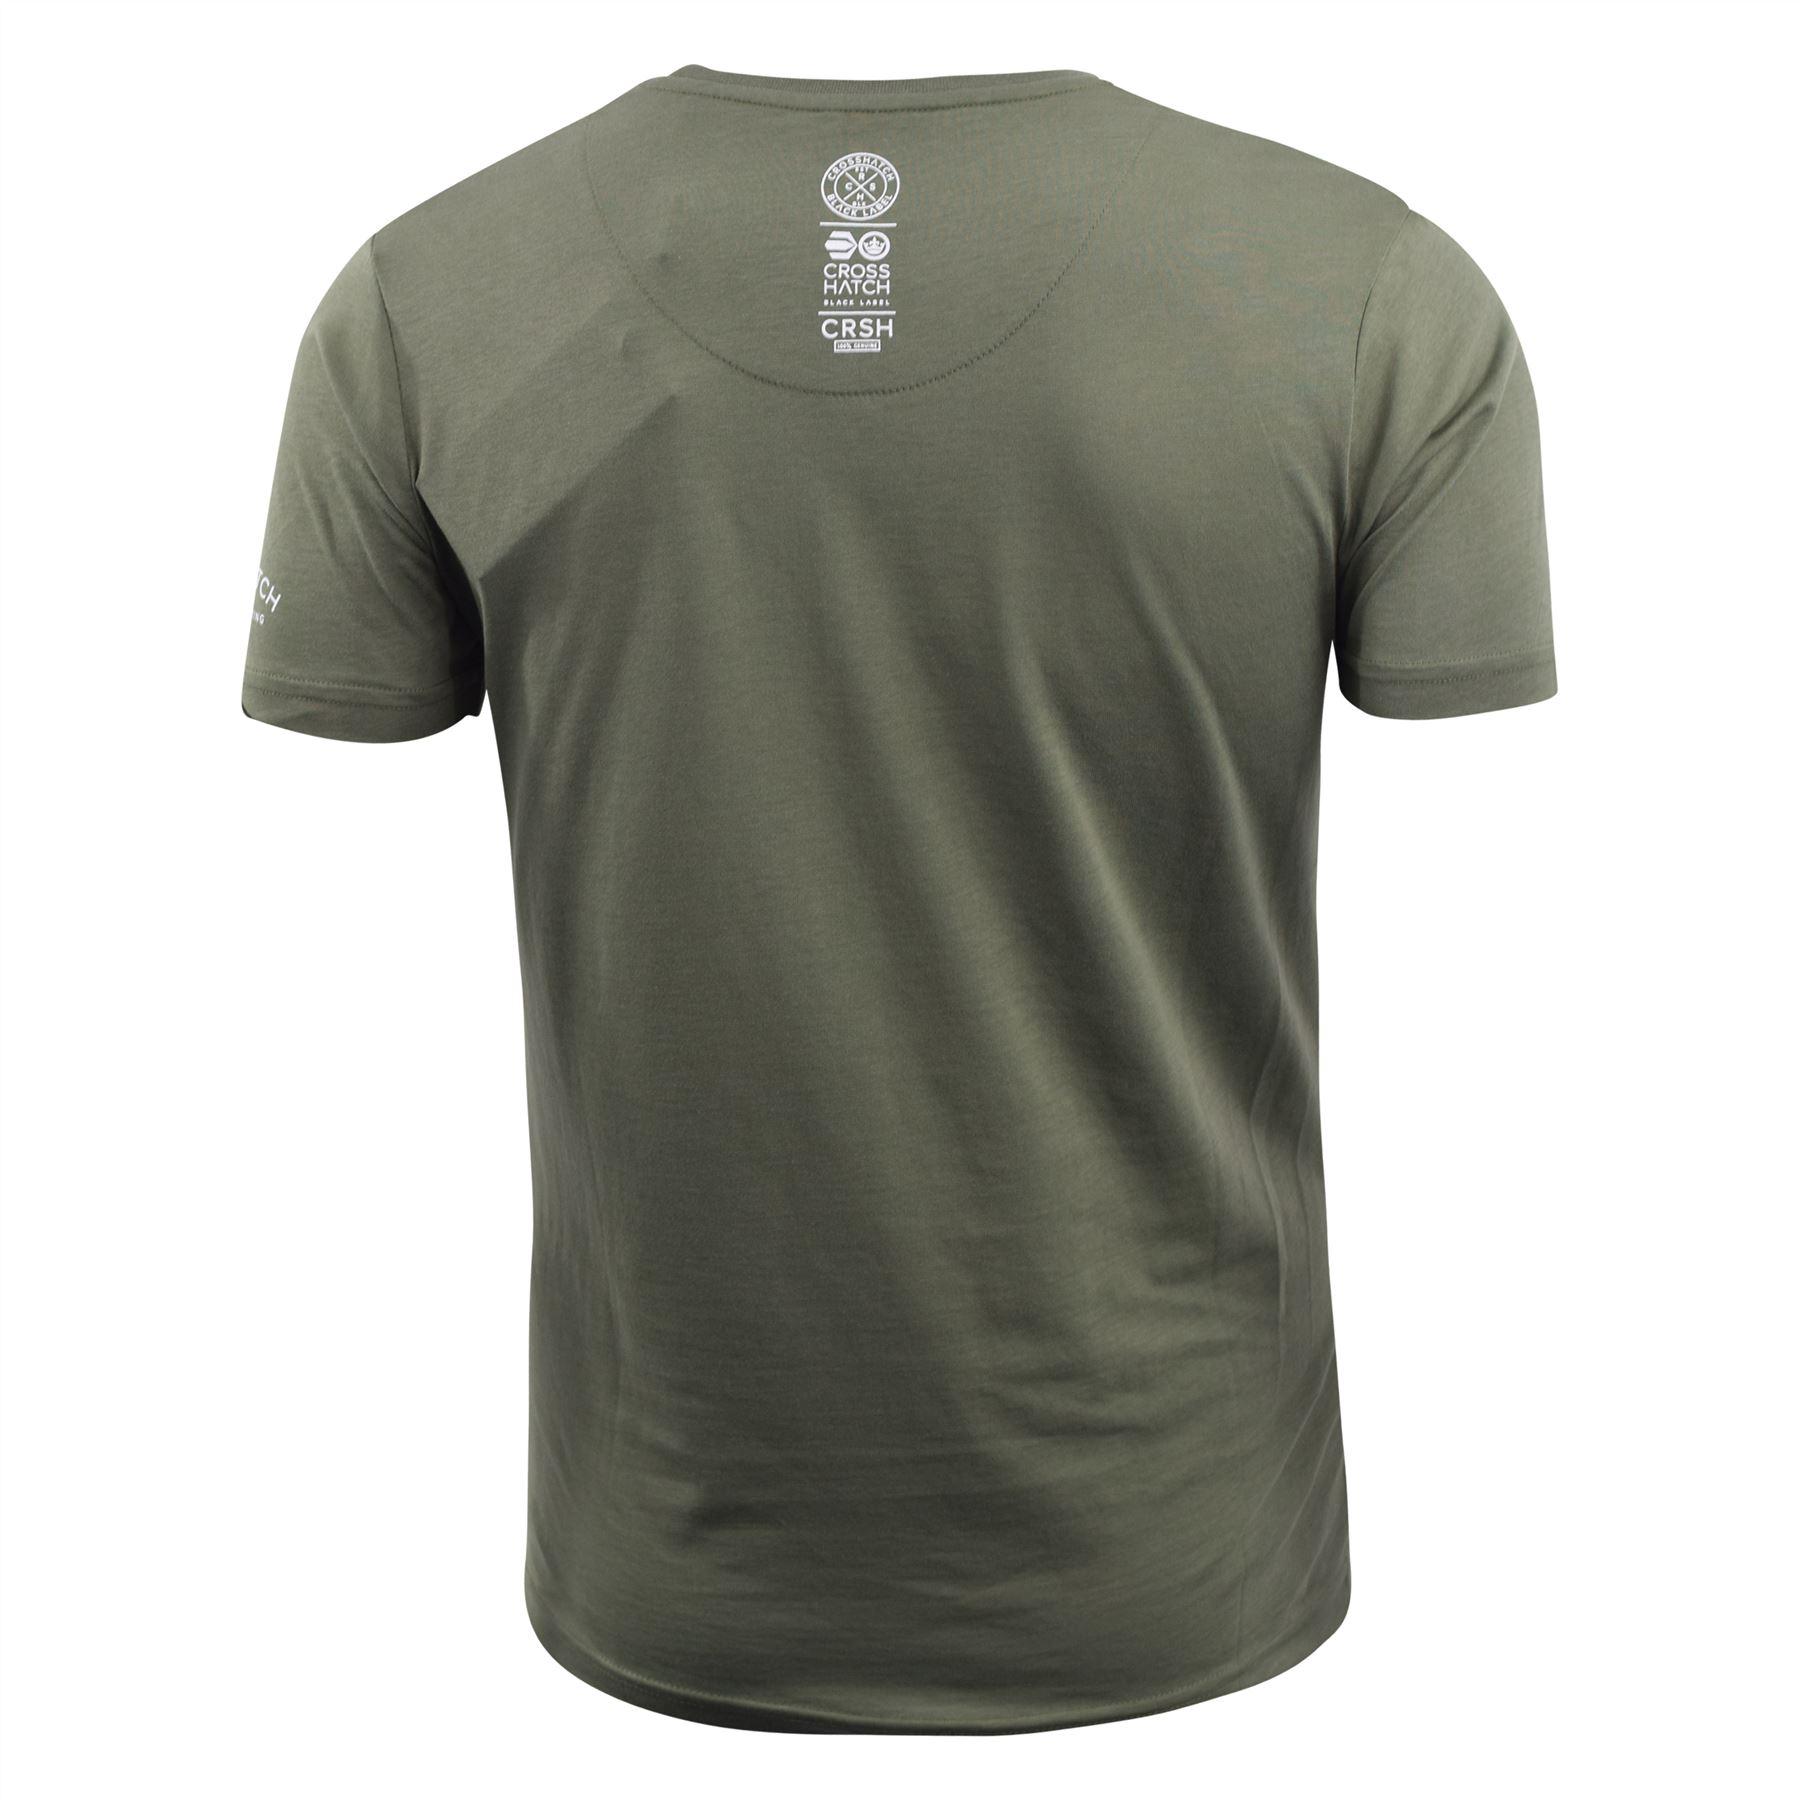 Mens-T-Shirt-Crosshatch-Short-Sleeve-Crew-Neck-Graphic-Tee-Top thumbnail 4